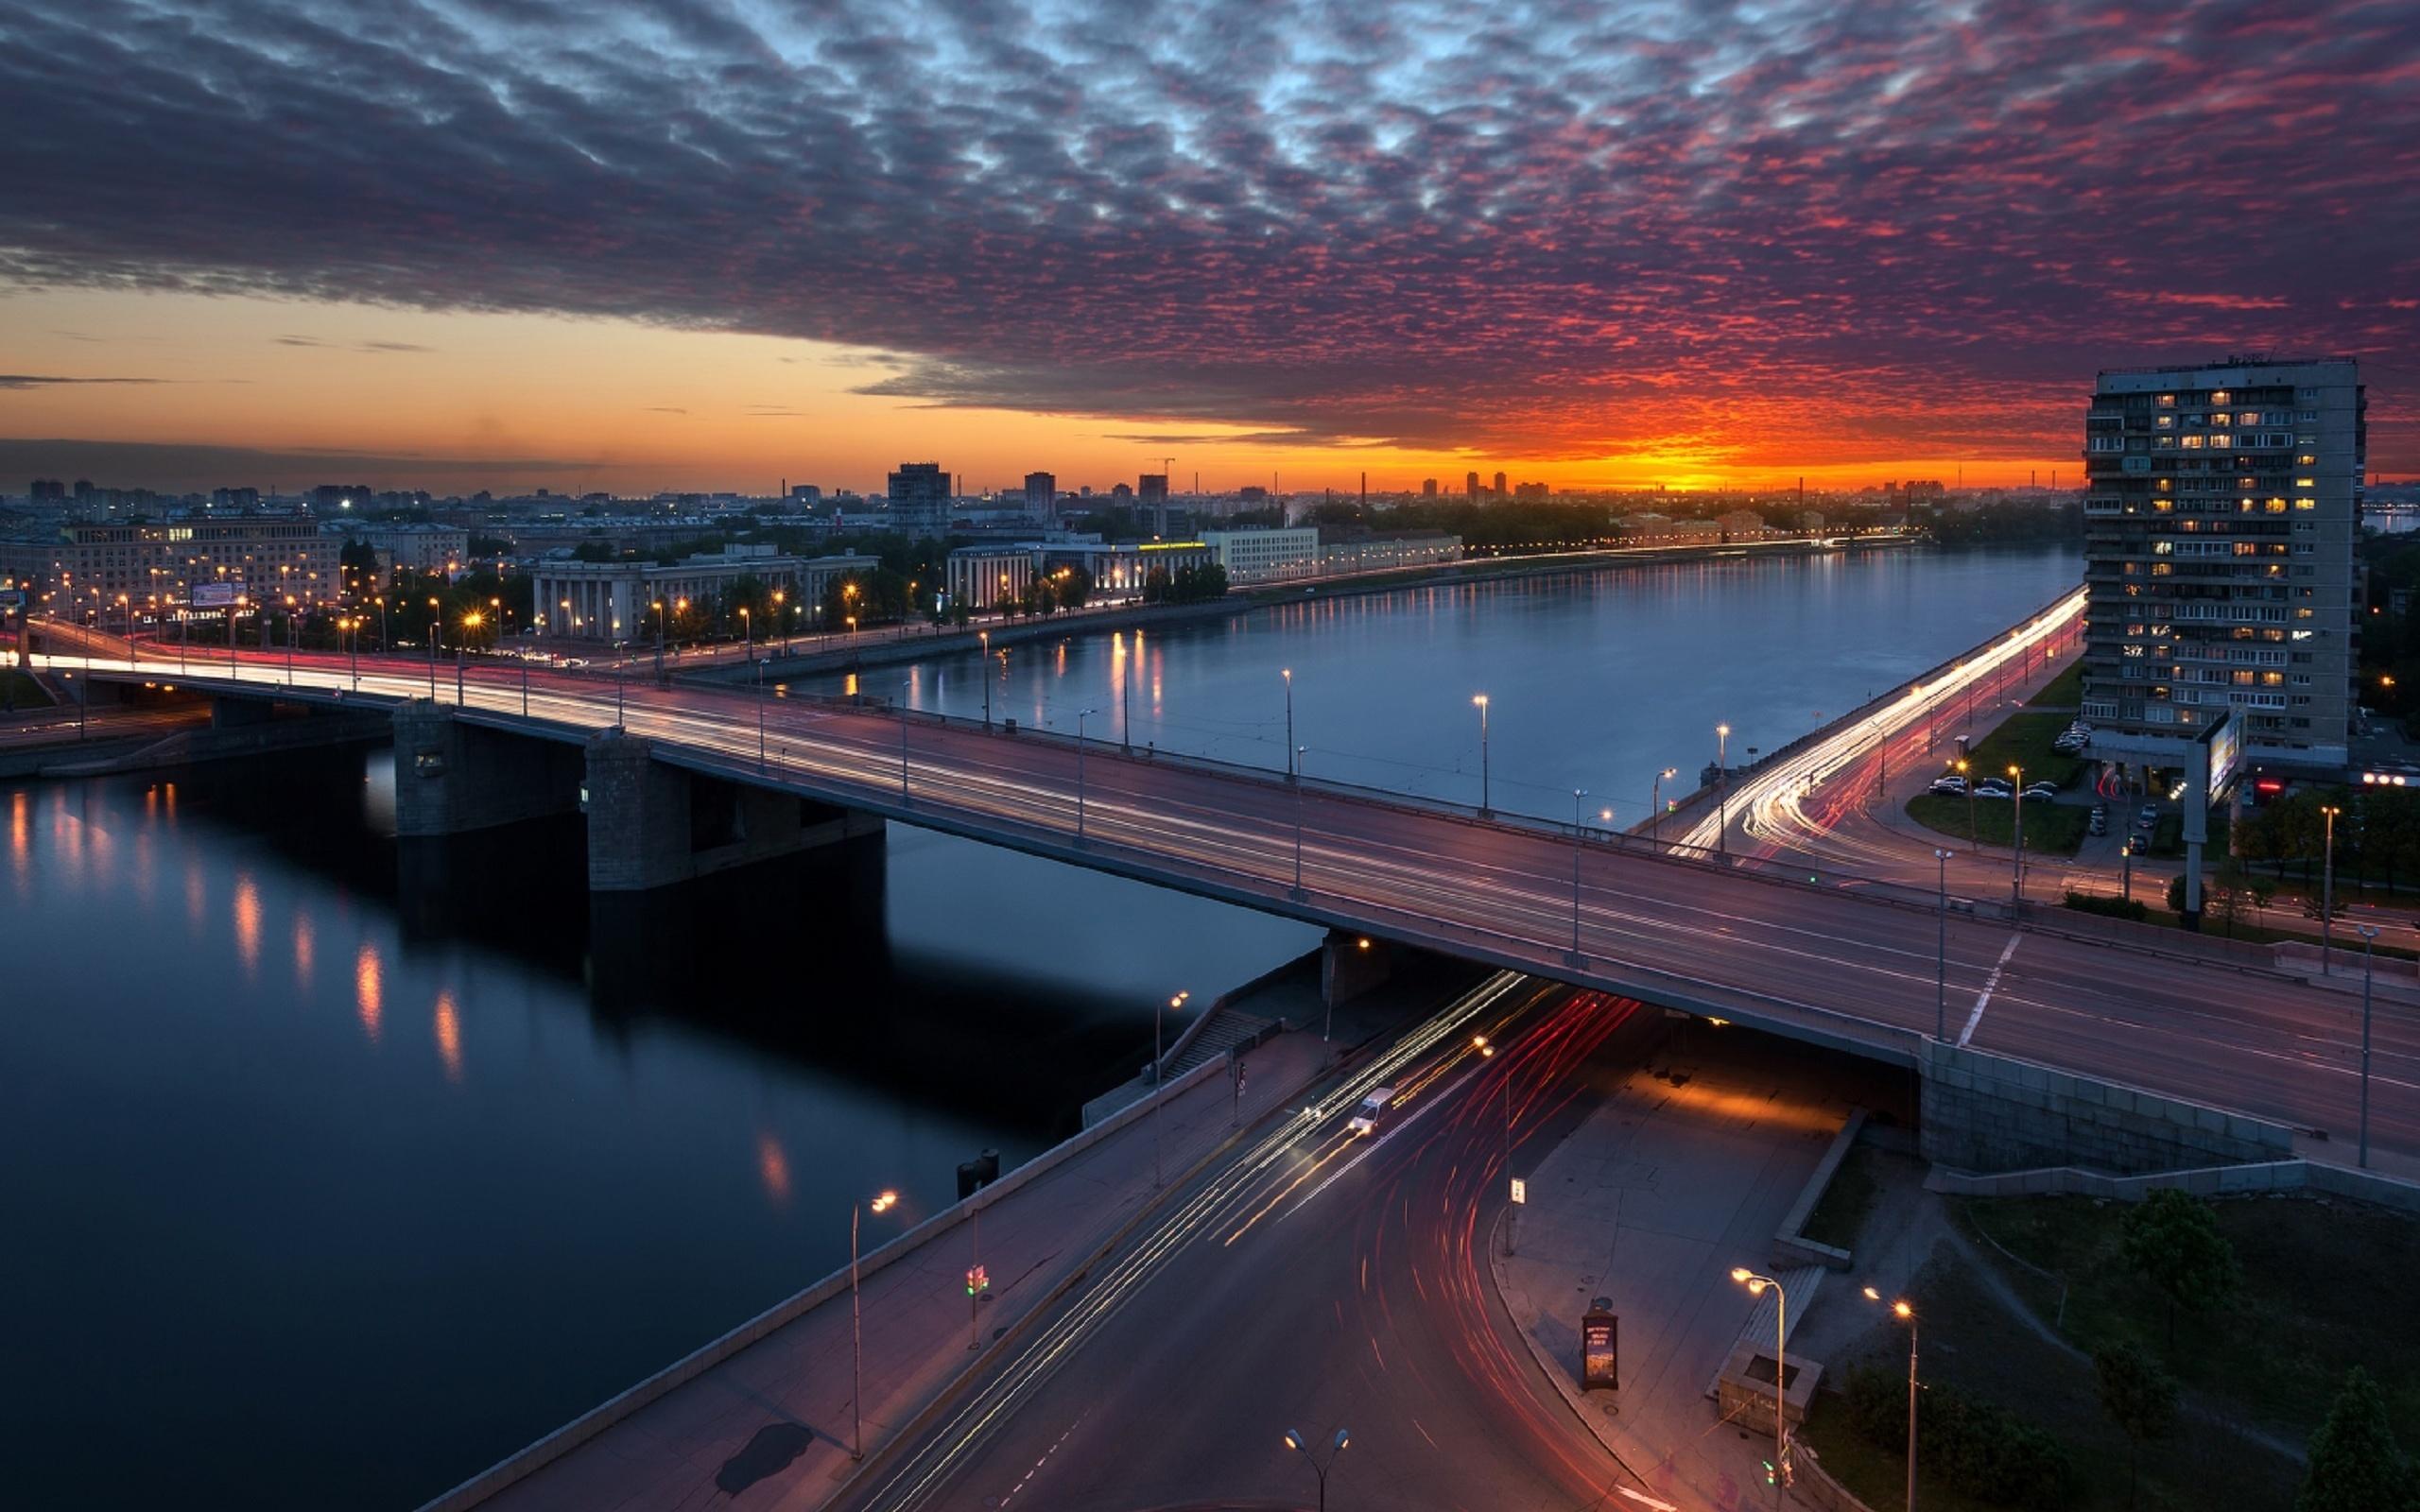 володарский, закат, мост, нева, облака, санкт-петербург, by krubek